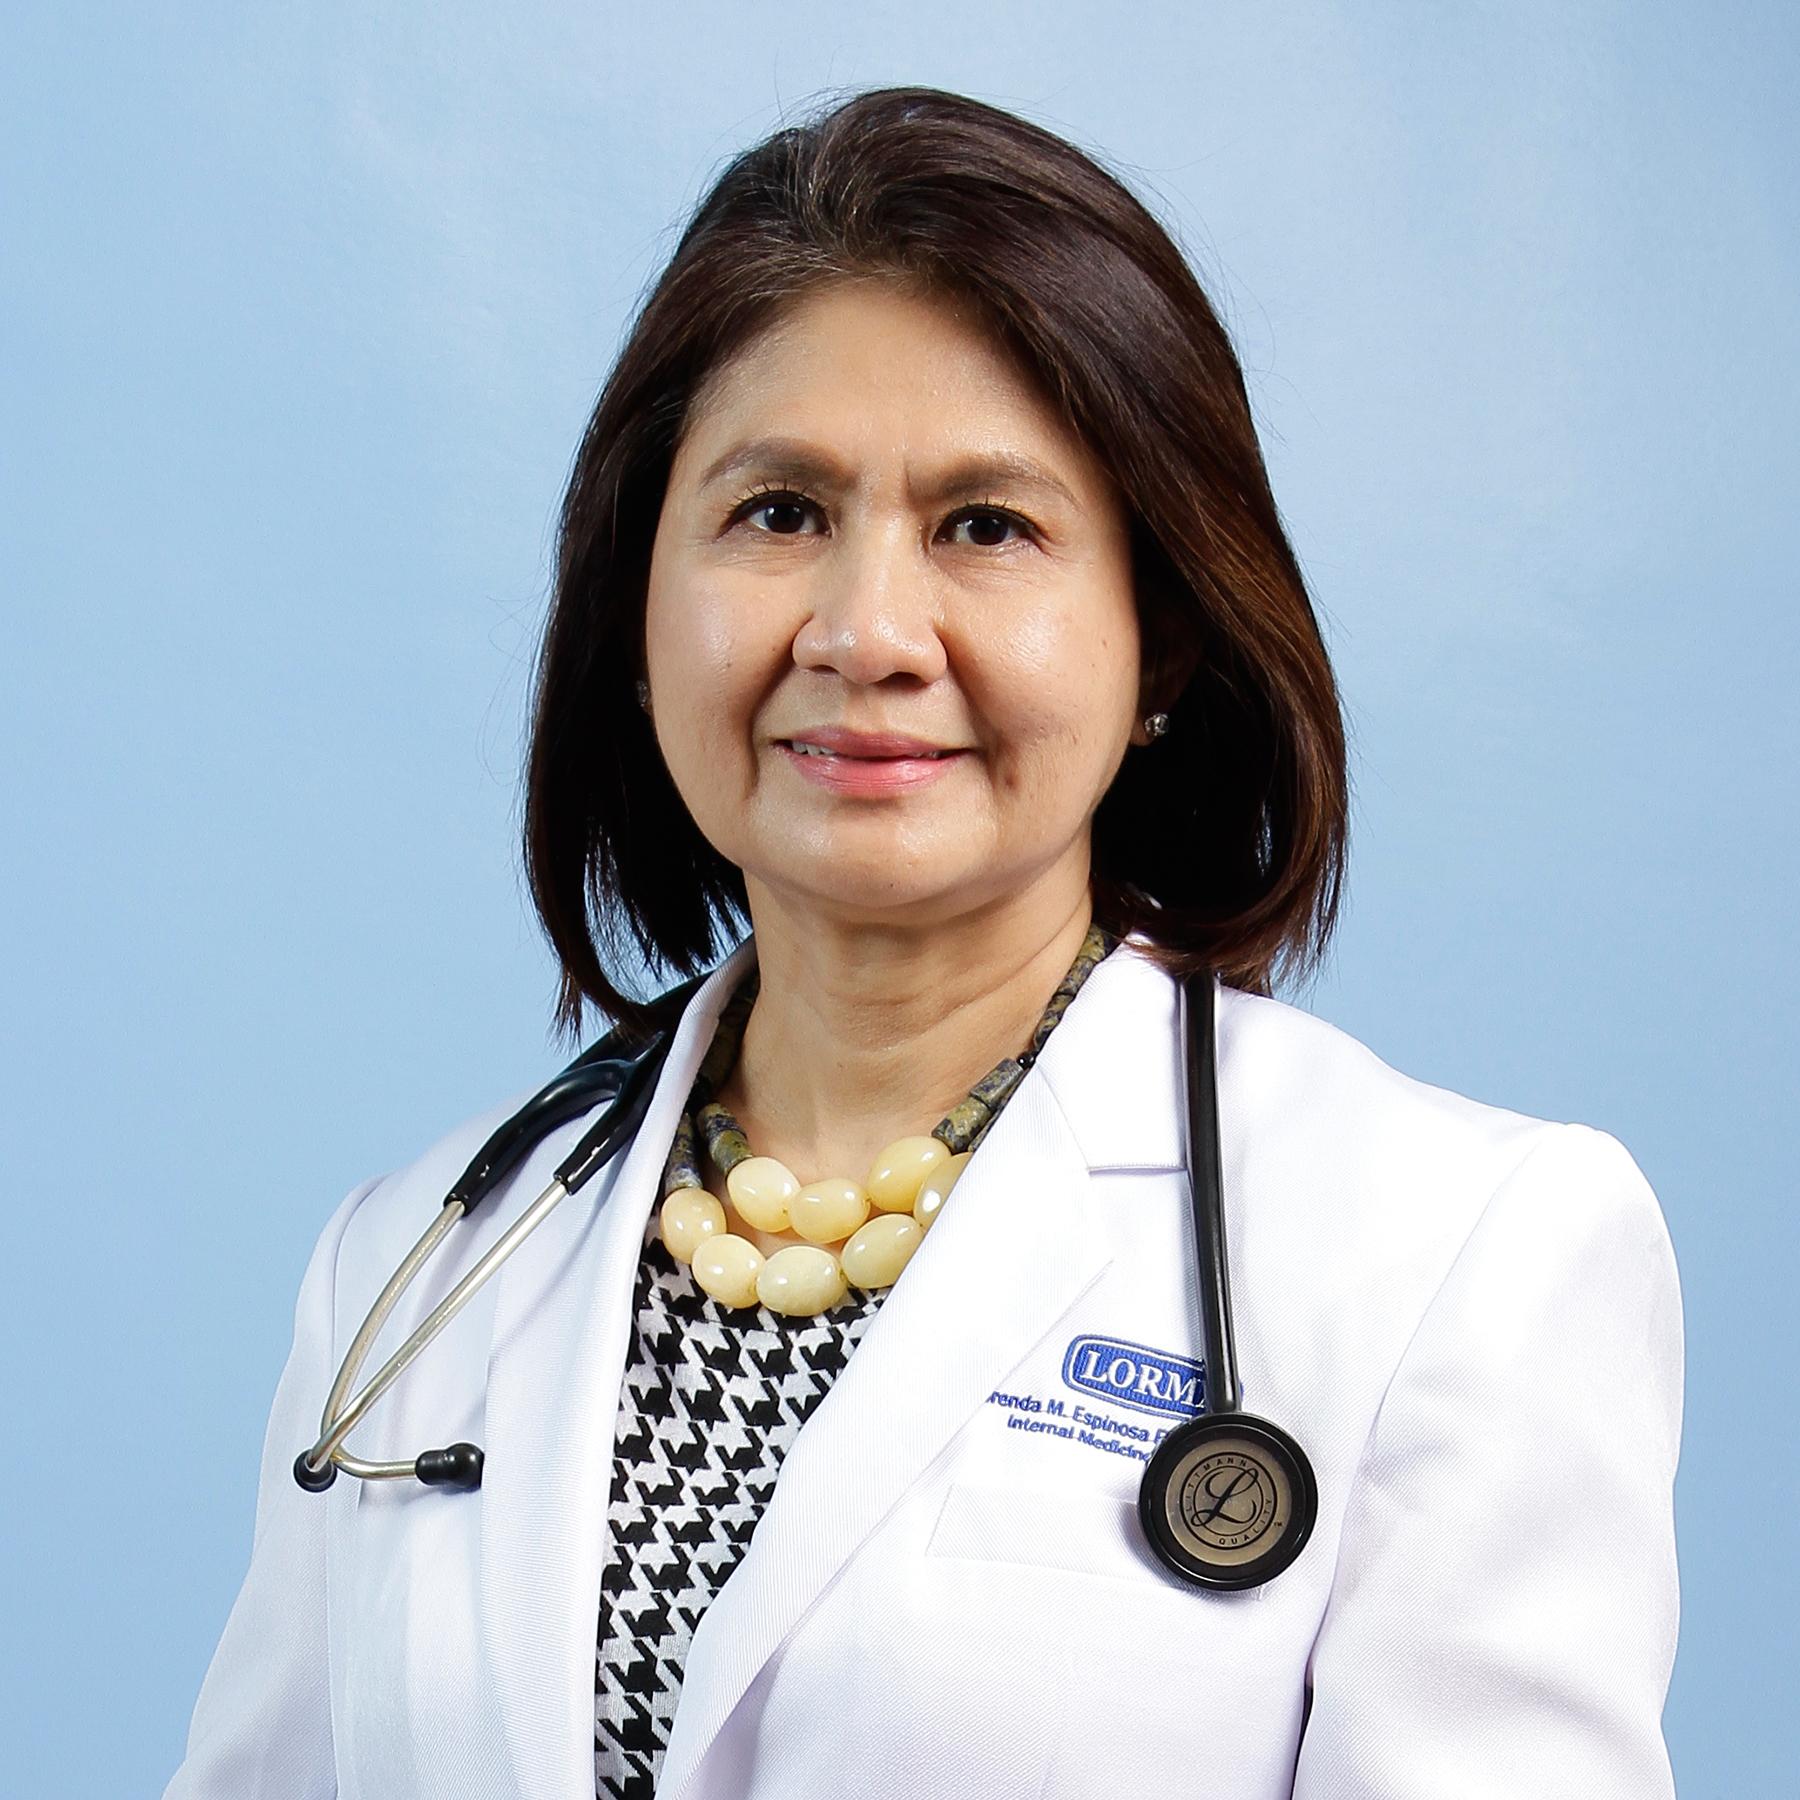 Brenda M. Espinosa